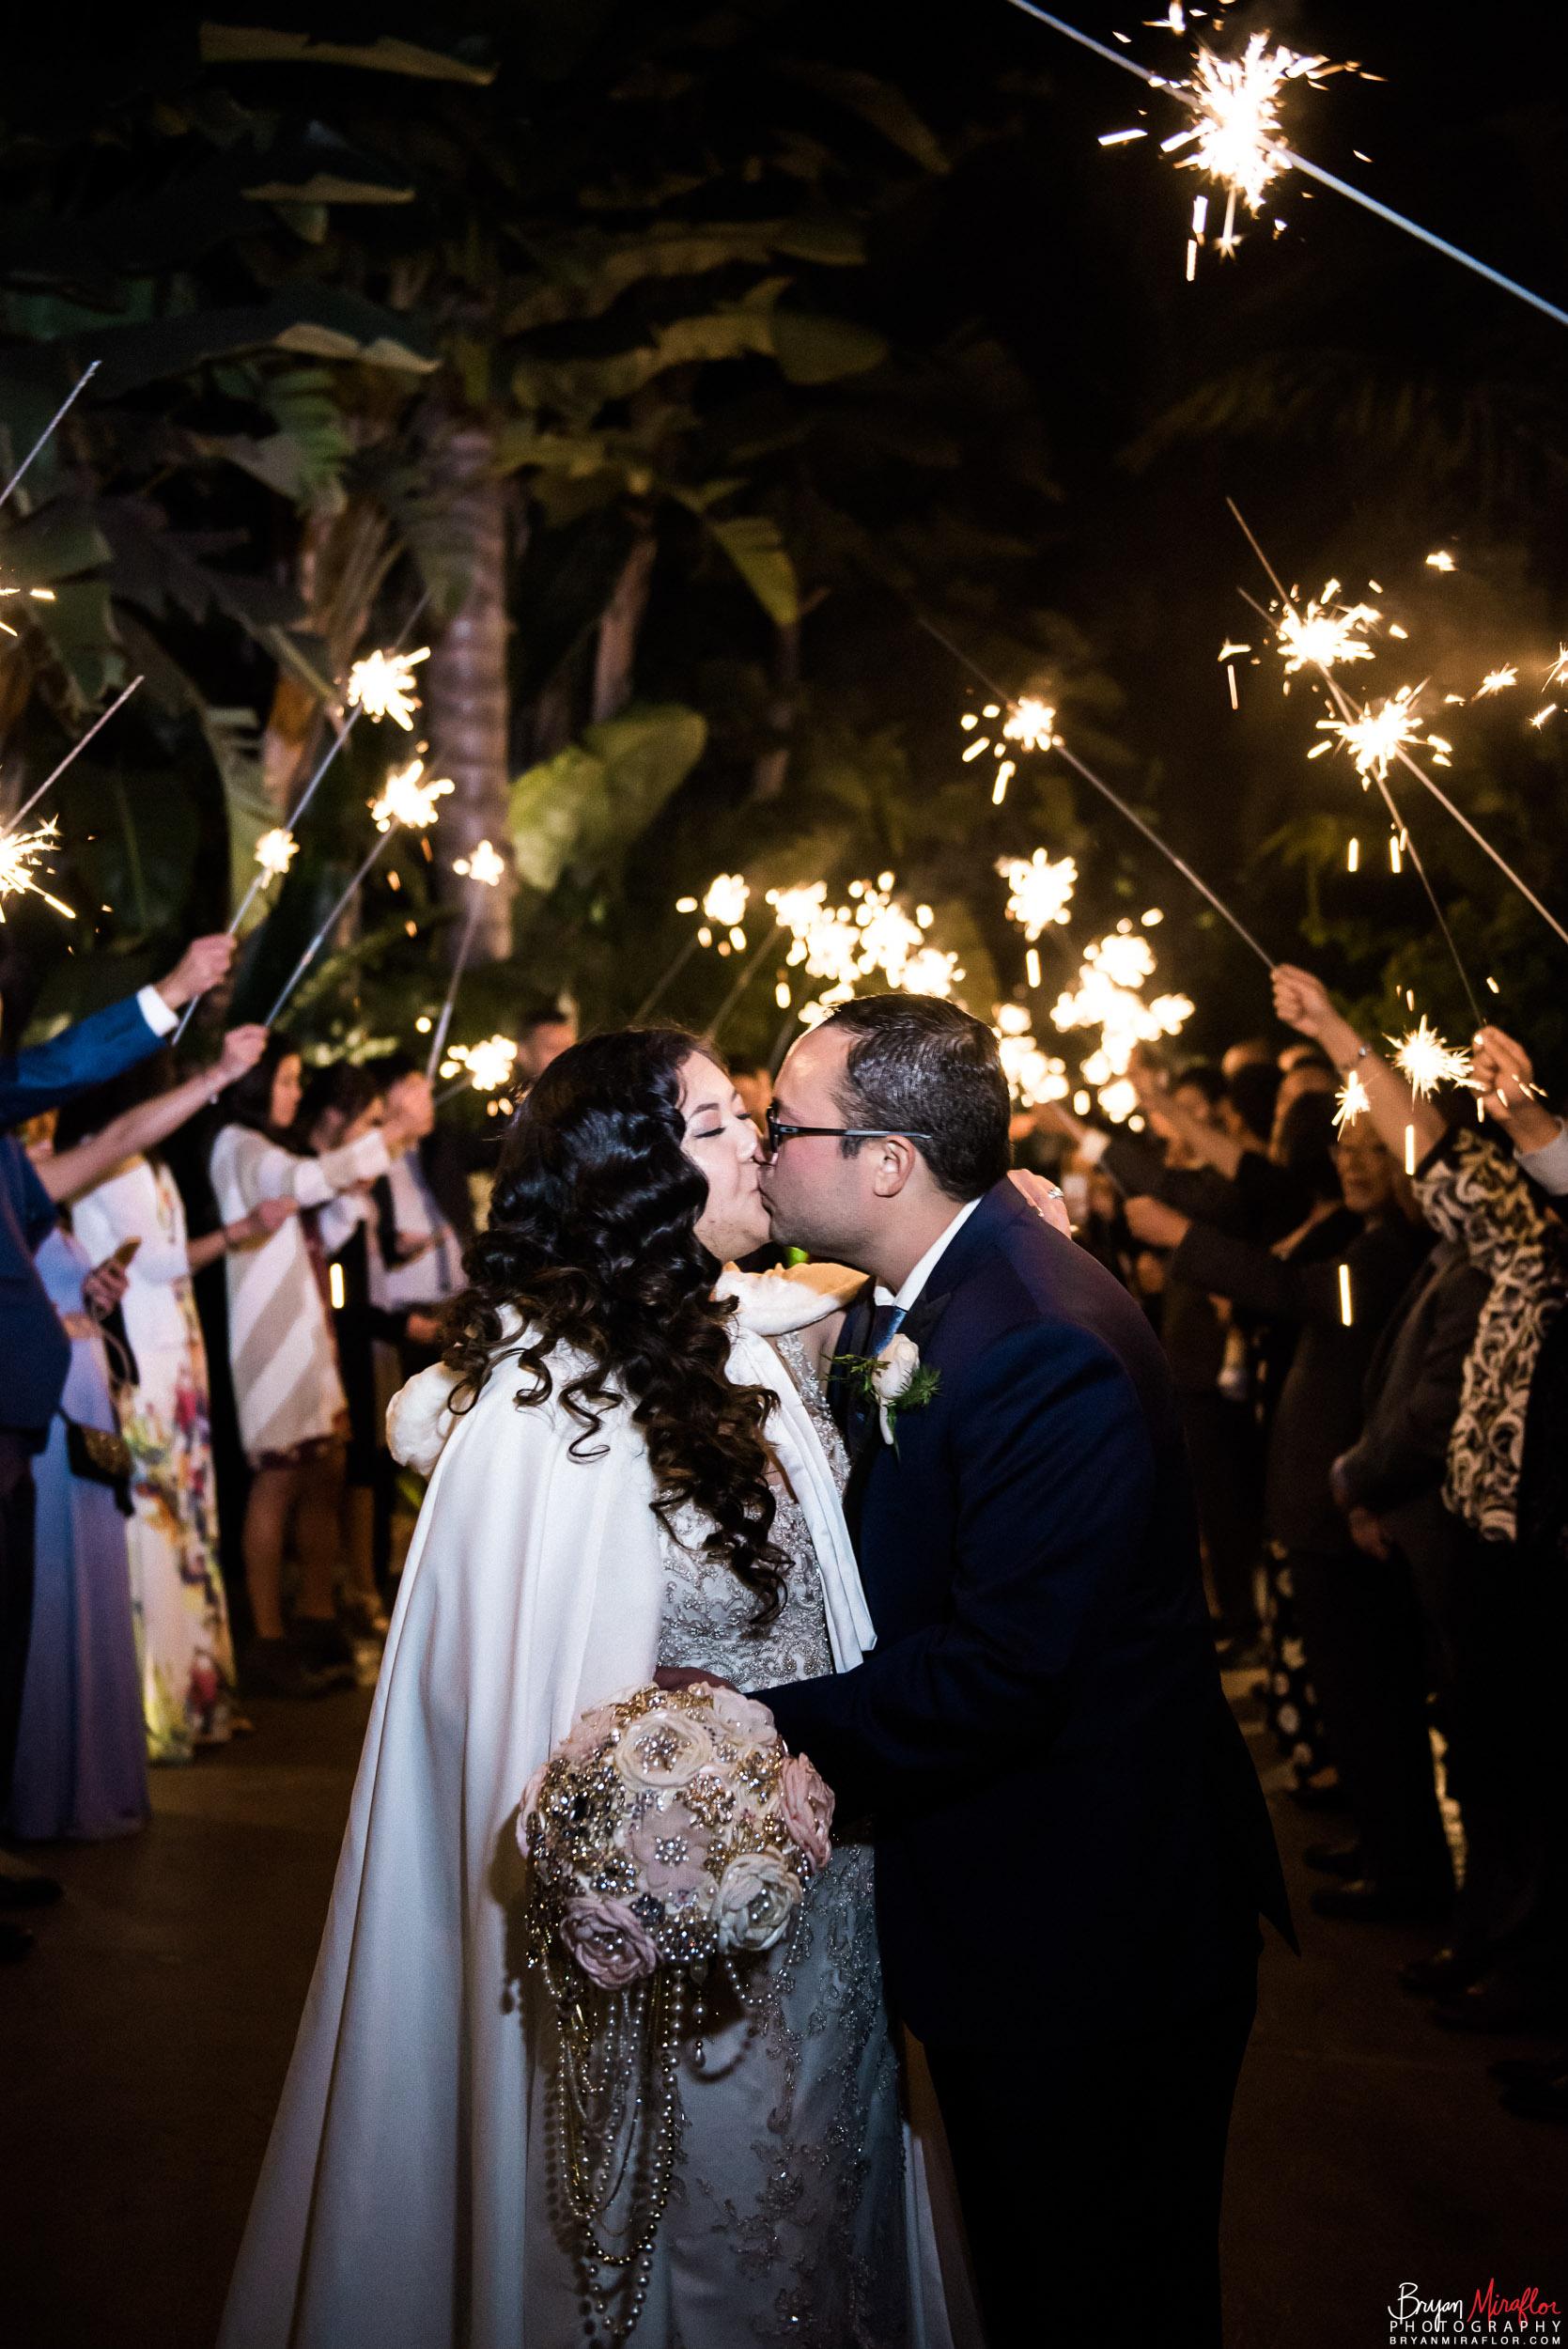 Bryan-Miraflor-Photography-Hannah-Jonathan-Married-Grand-Traditions-Estate-Gardens-Fallbrook-20171222-242.jpg